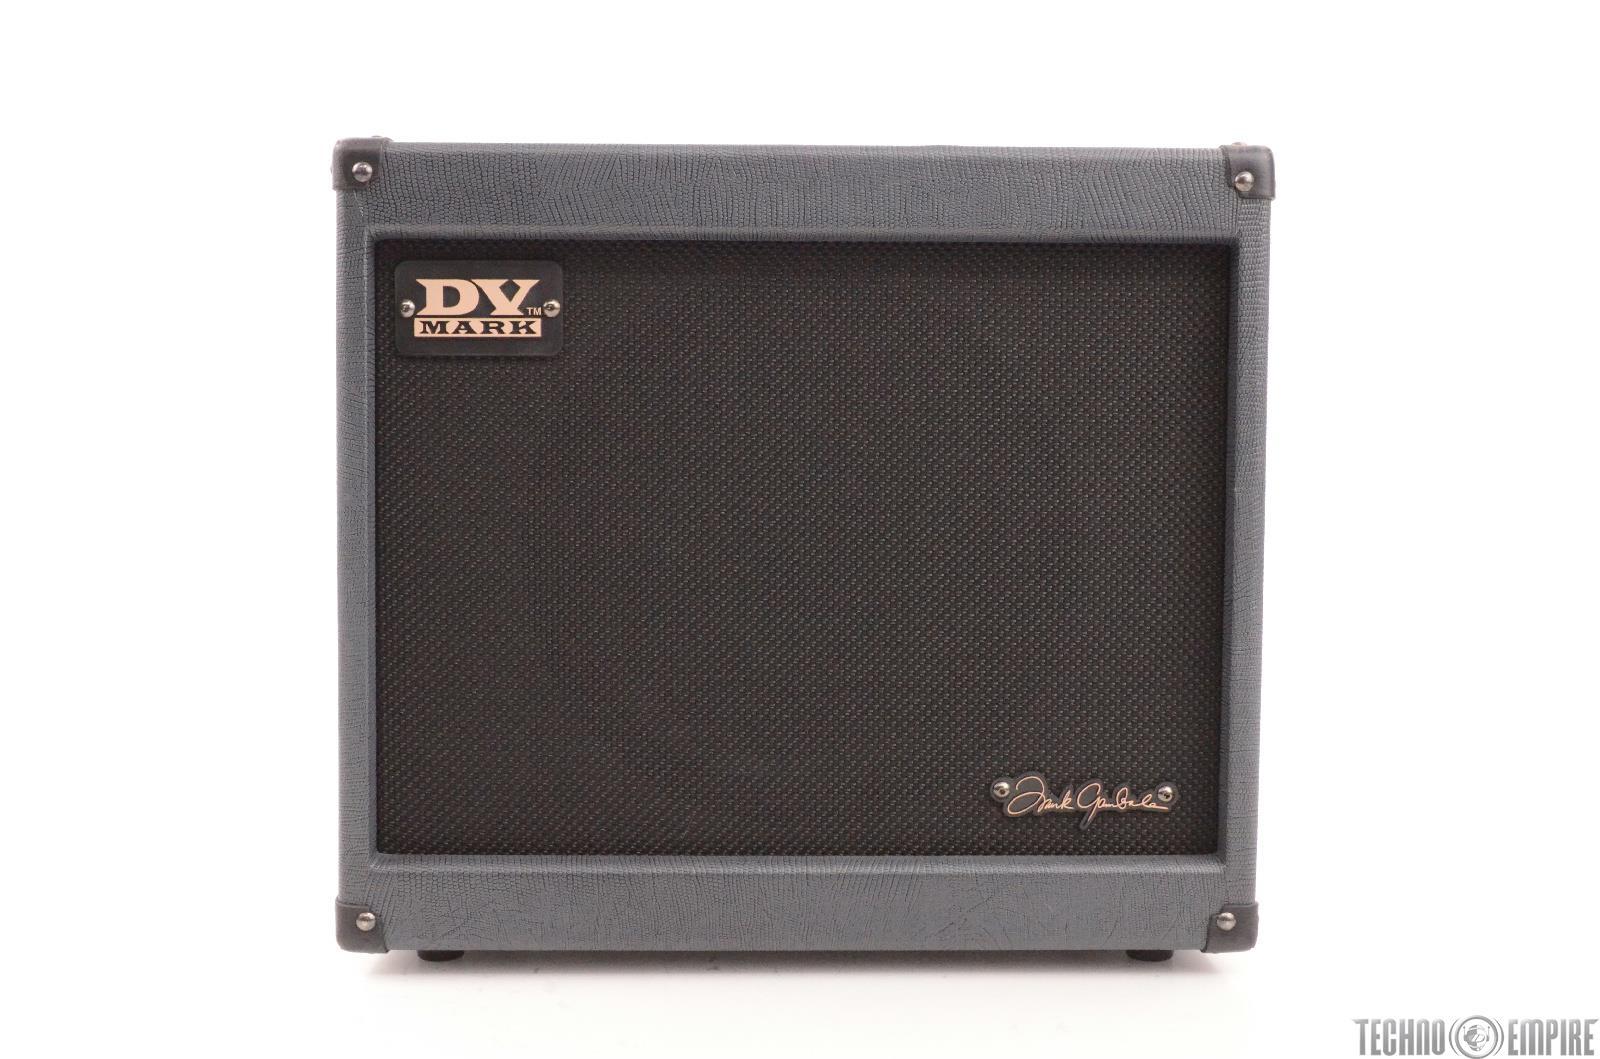 DV MARK FRANK GAMBALE Combo 112 Guitar Amplifier 1x12 Signed By FRANK! #26844 (PENDING REPAIR)